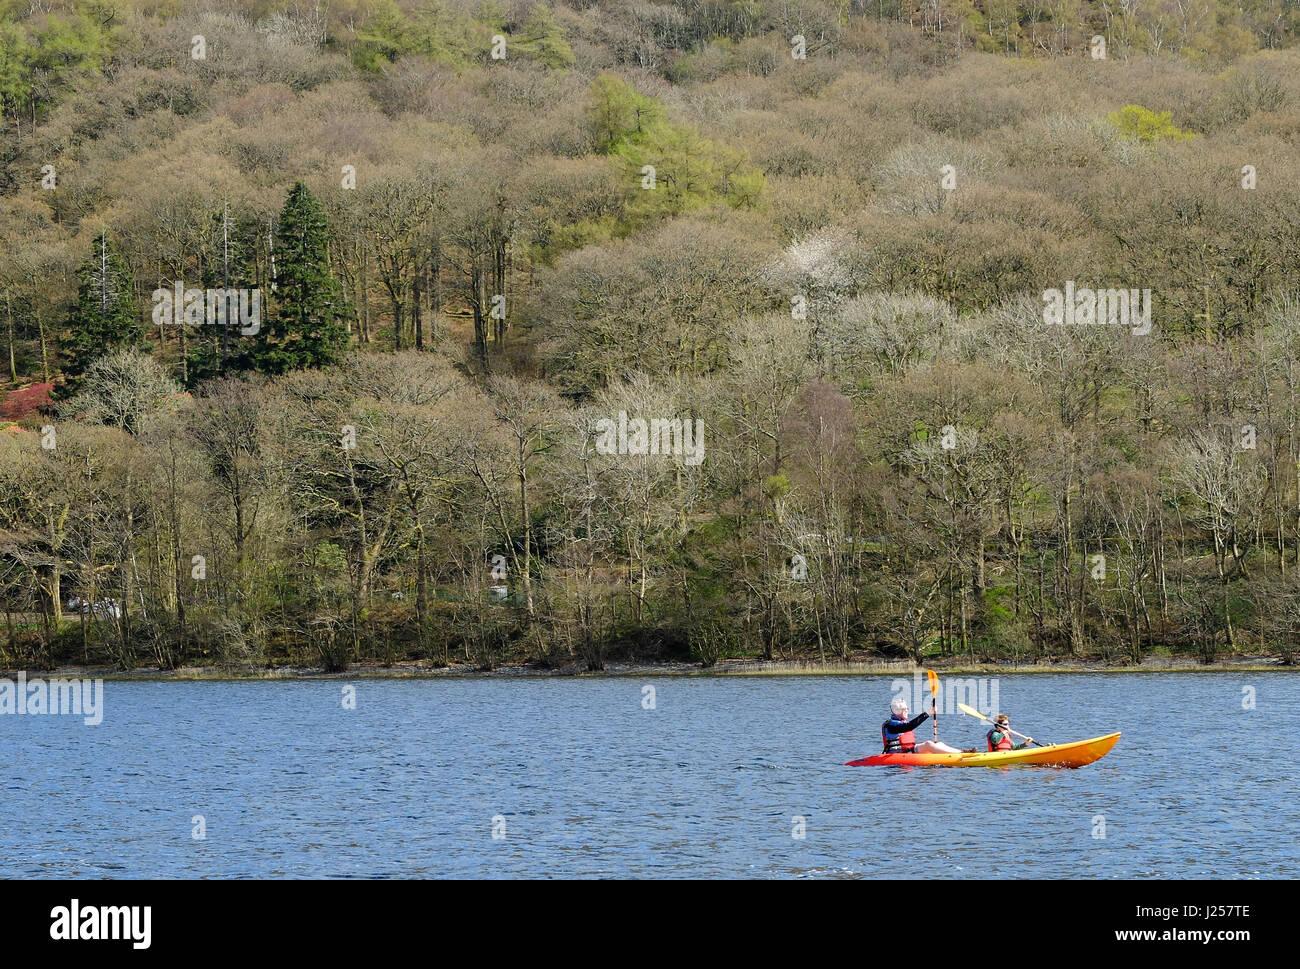 Padre e hijo canotaje en el lago Coniston, Cumbria Imagen De Stock